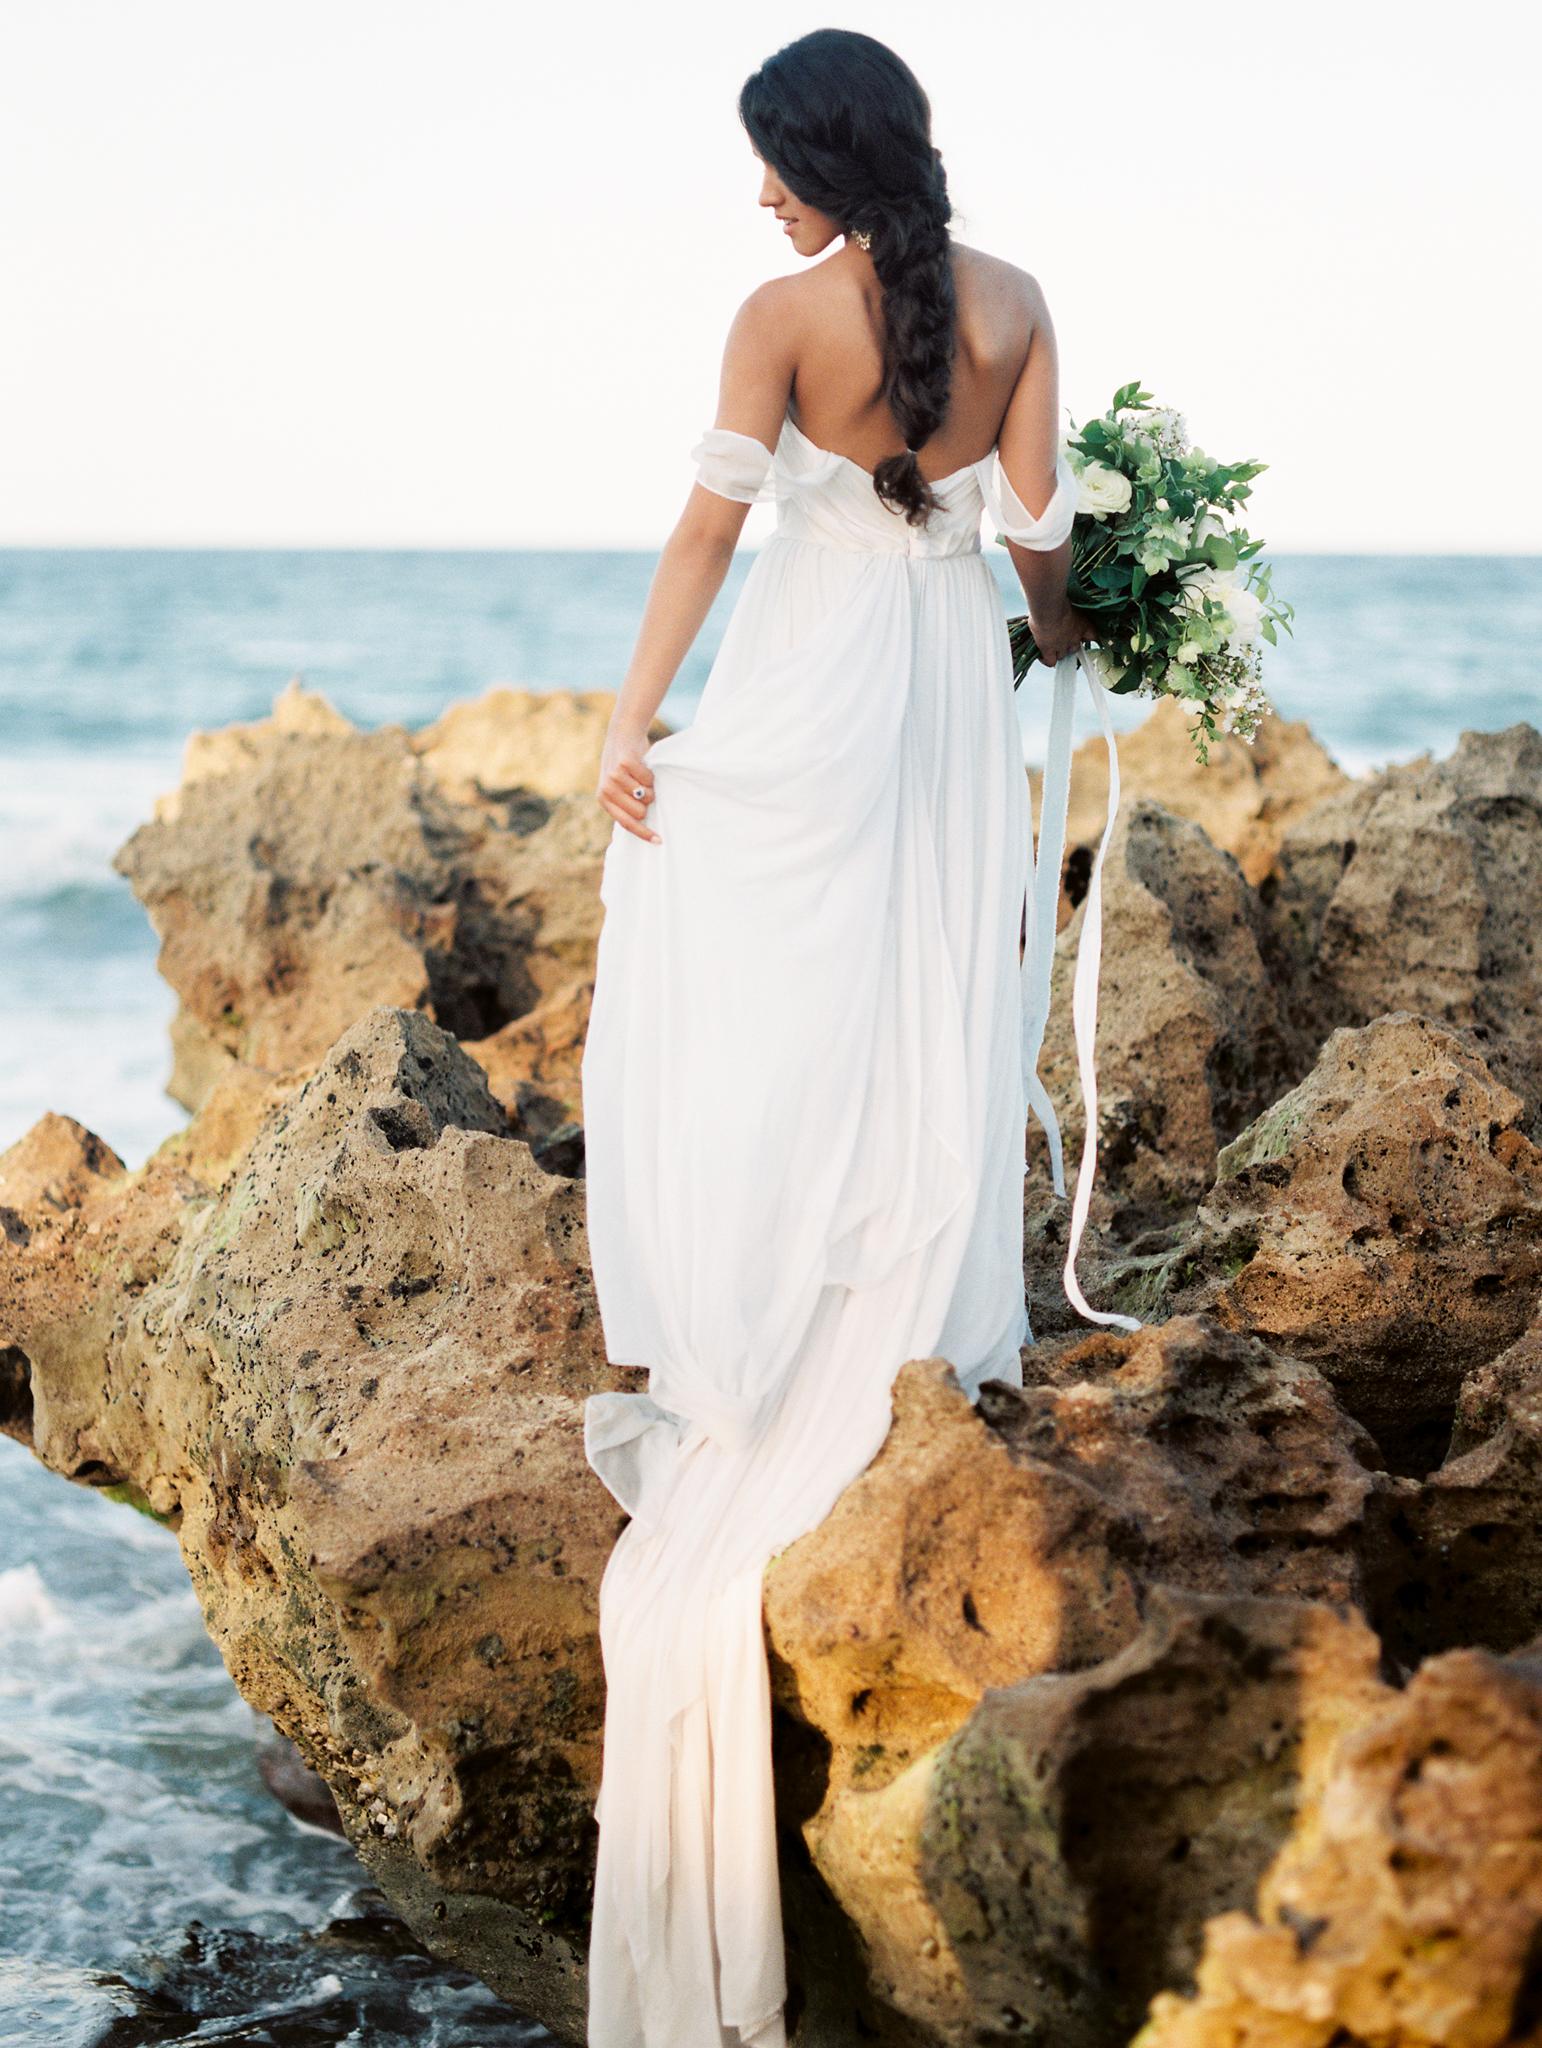 coral cove, jupiter beach FL, palm beach wedding photos, wedding dress on bride photos